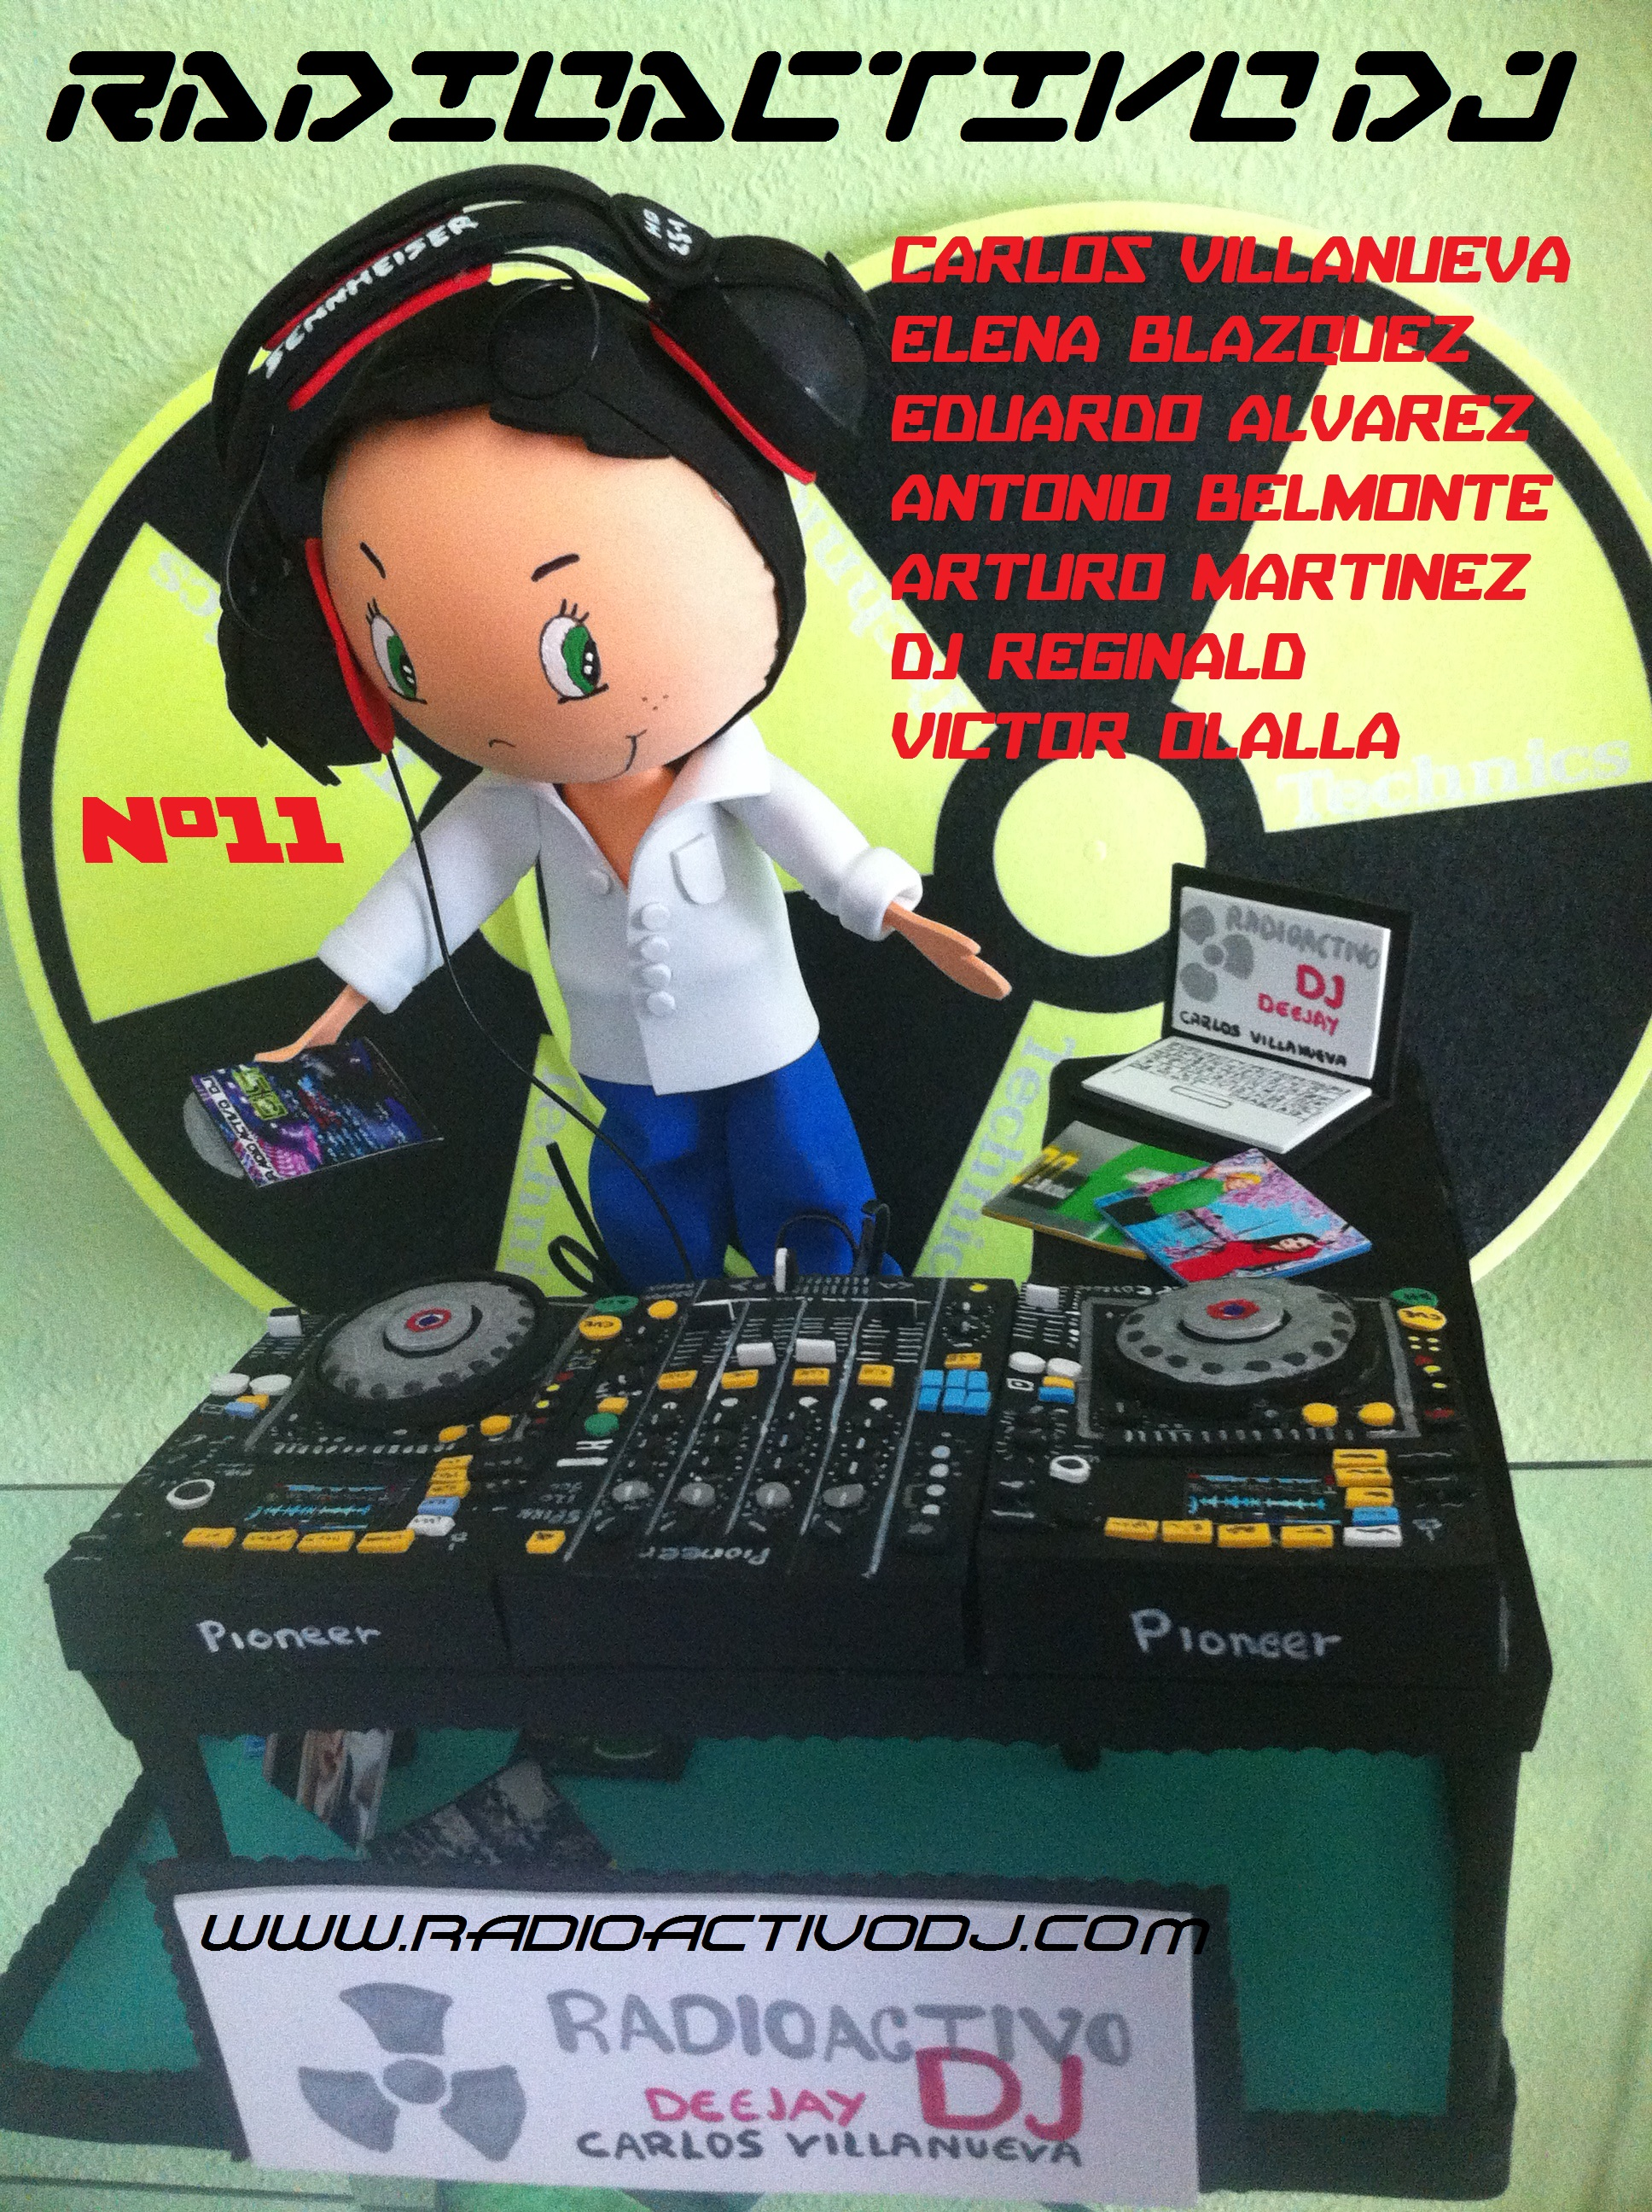 RADIOACTIVO DJ 11-2014